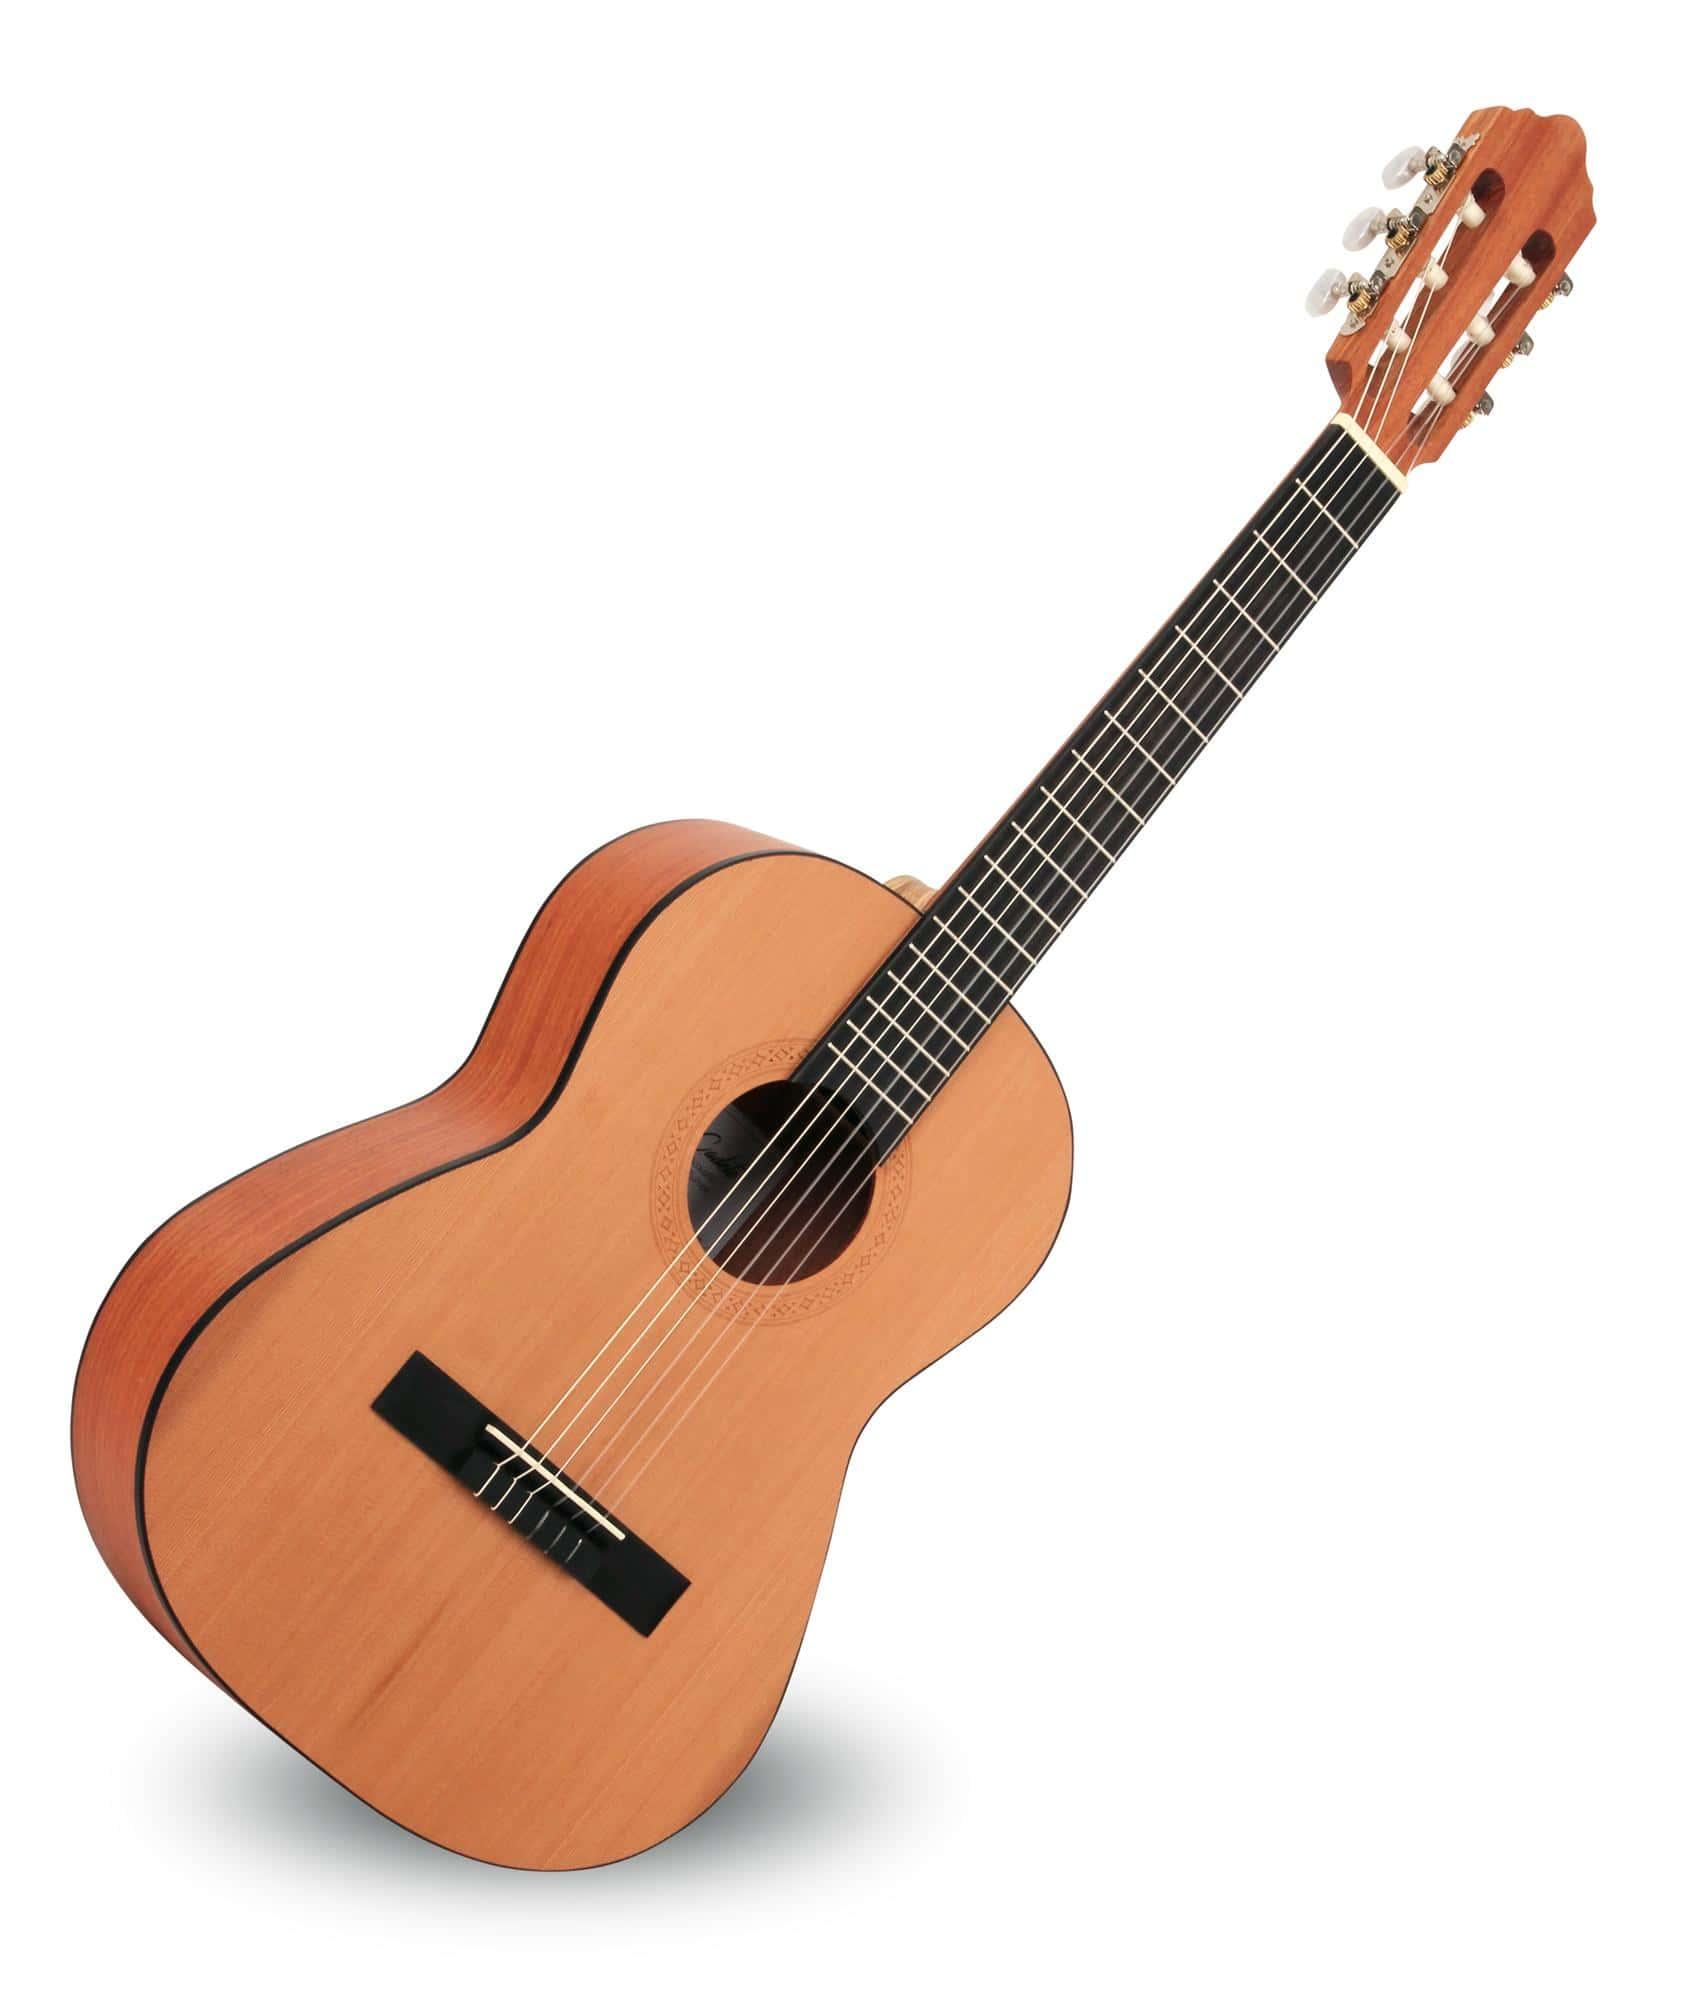 Calida Cadete Konzertgitarre 1|2 Zeder Matt Made in Portugal